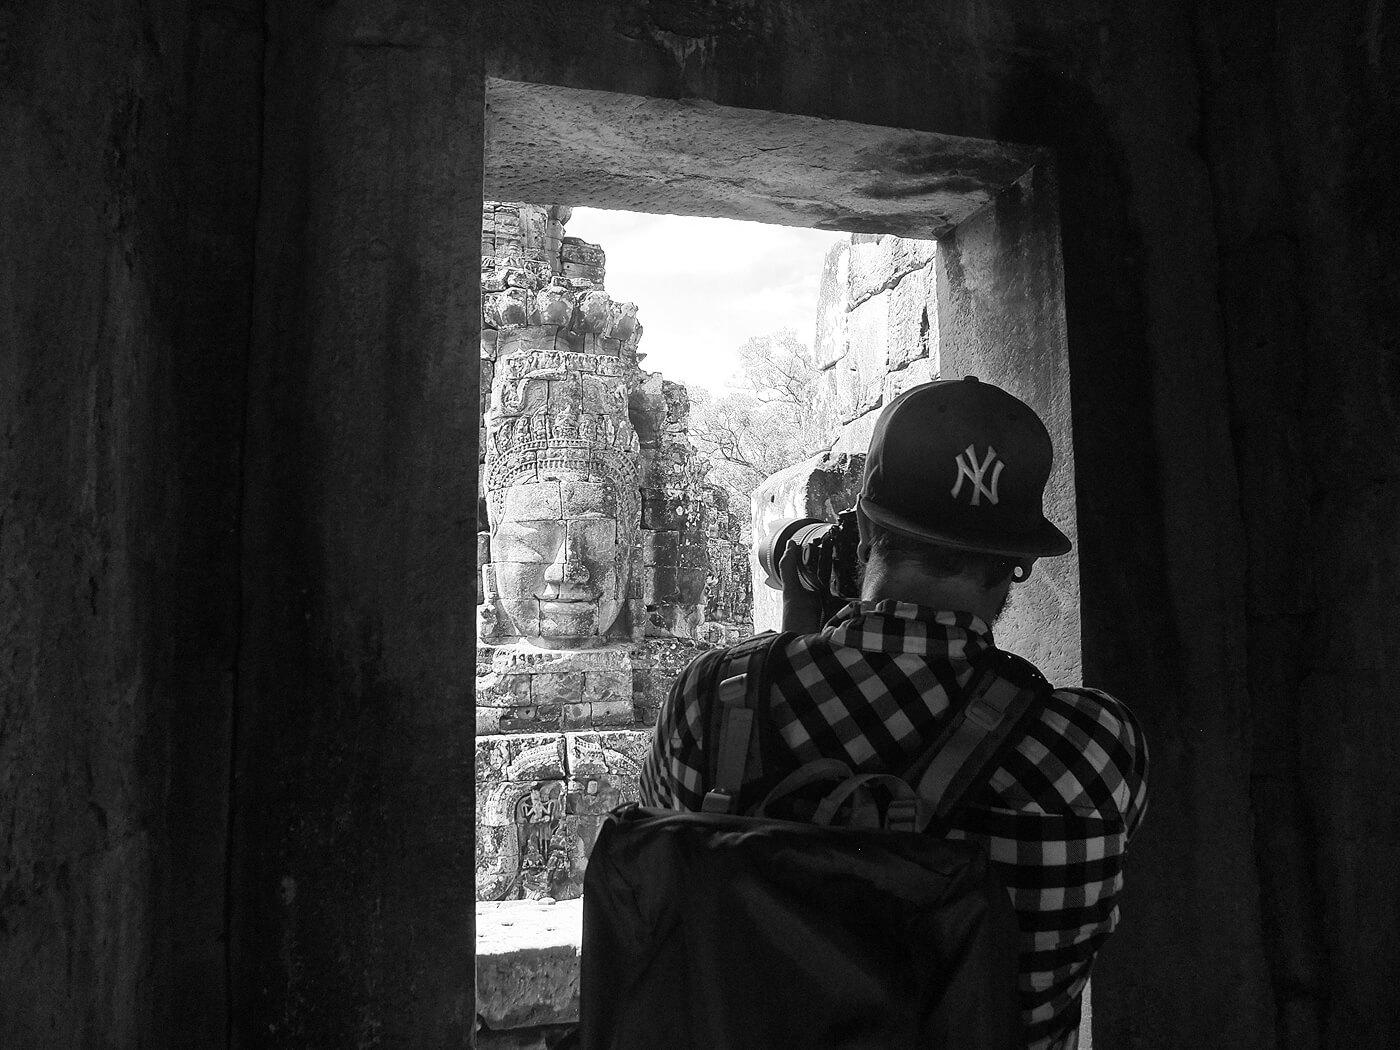 Bildband Südostasien - Reisefotografie aus Angkor Wat, Angkor Thom, Kambodscha